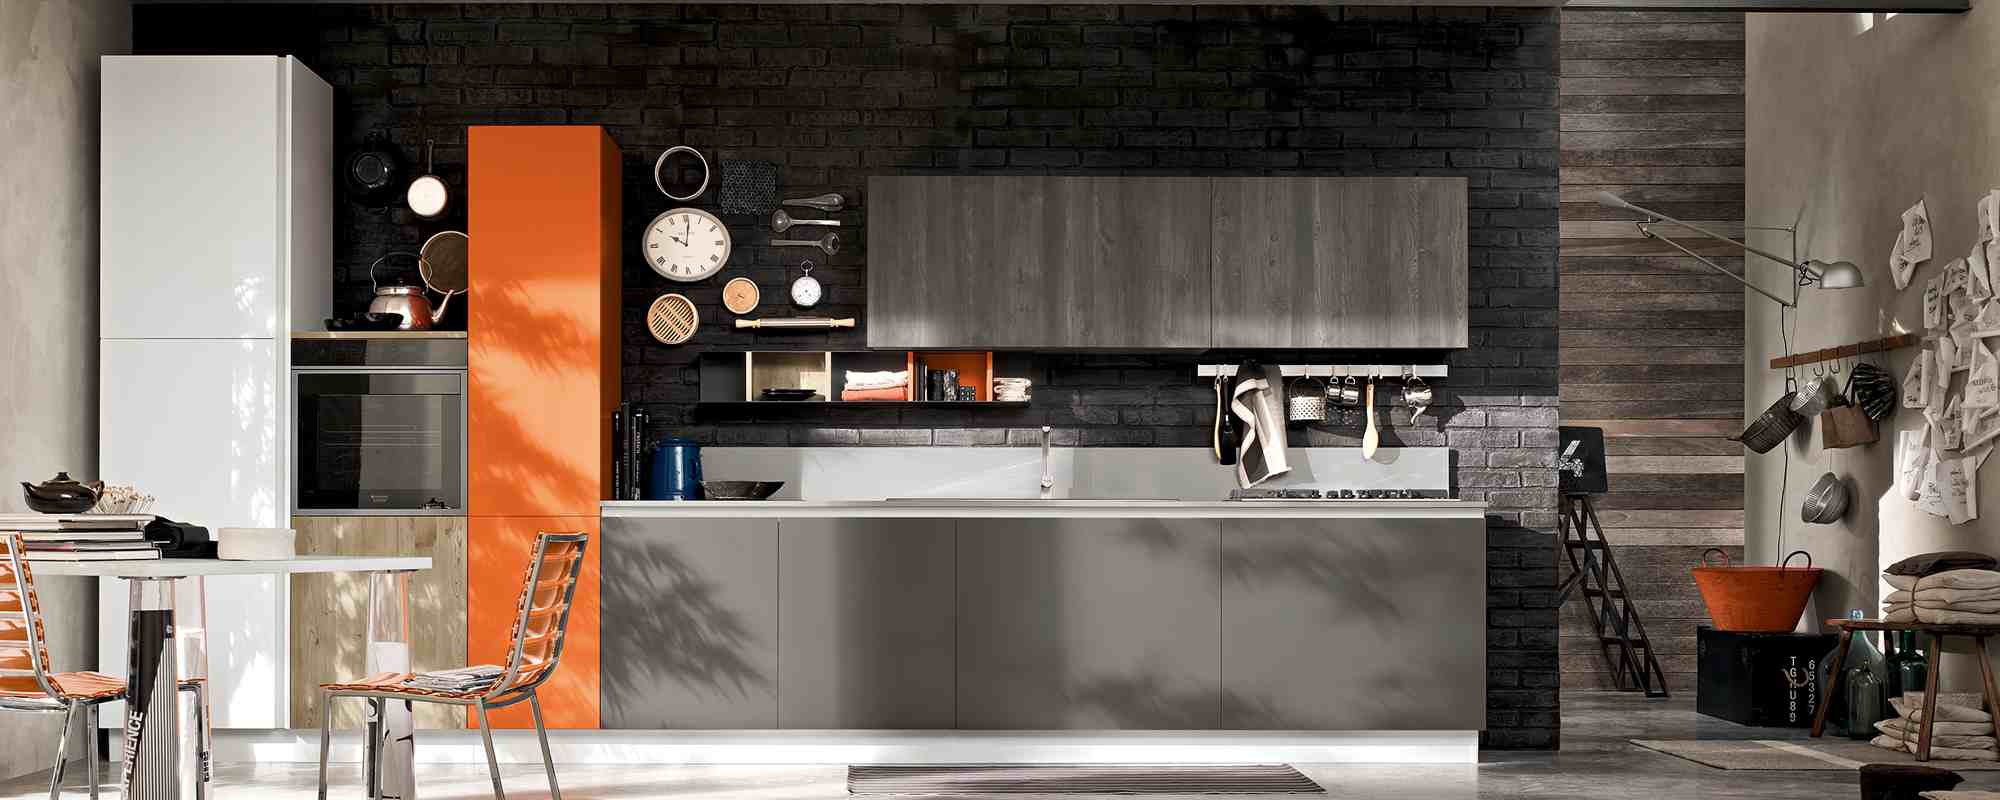 Catalogo Piastrelle Cucina | Piastrelle Per La Cucina Leroy Merlin ...